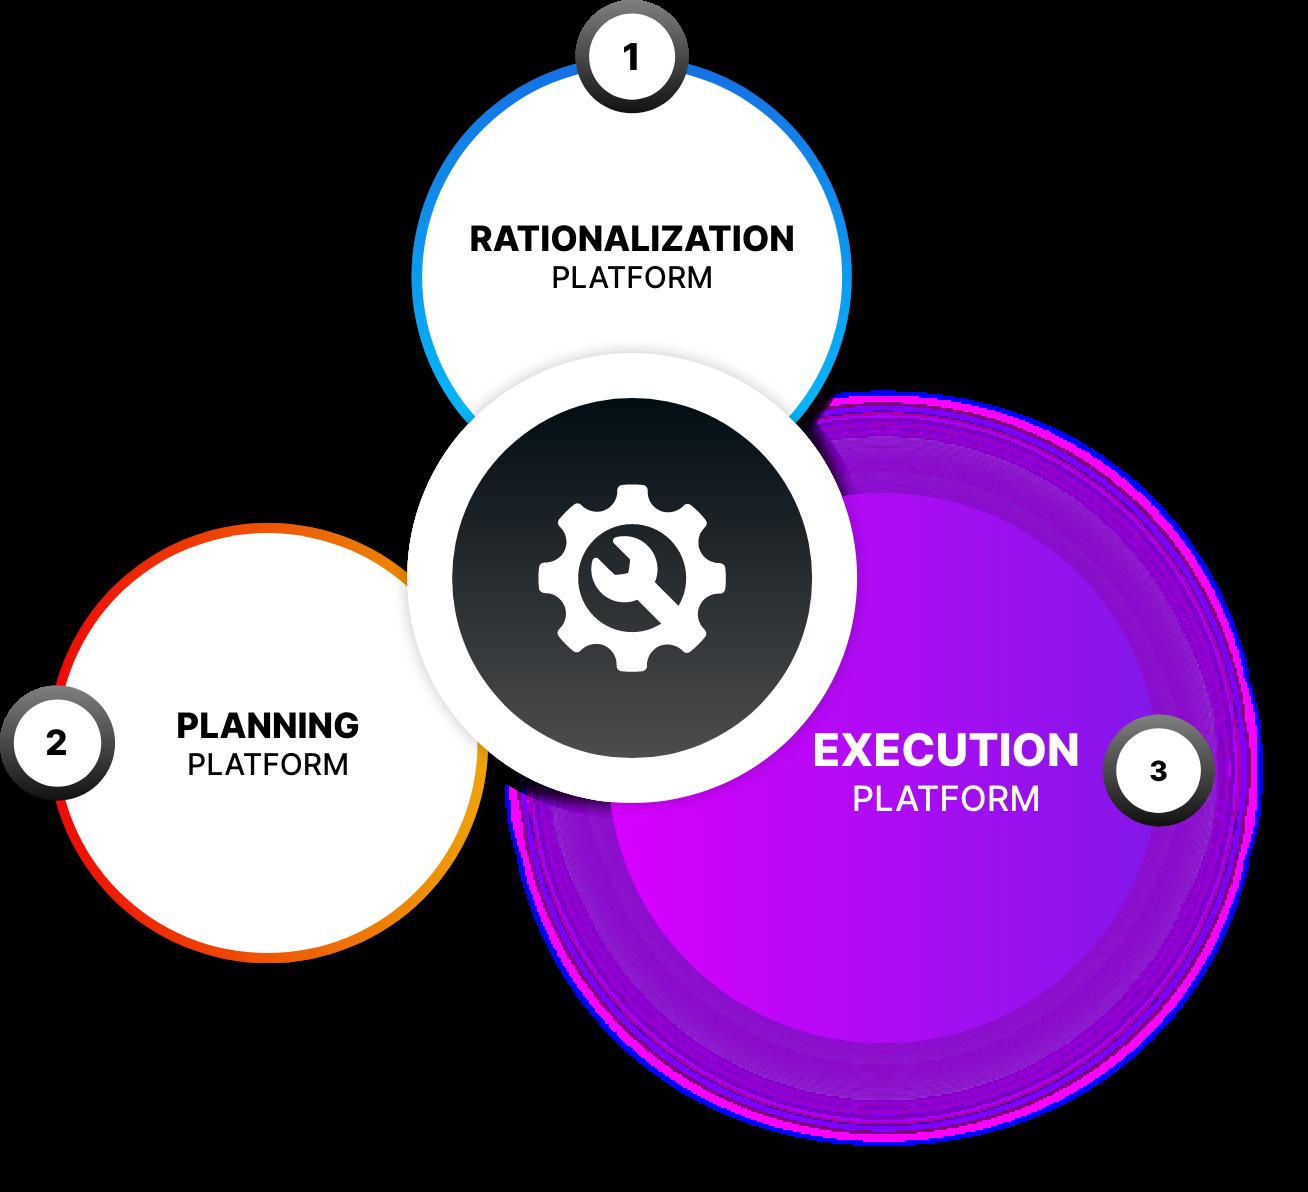 Execution Platform Image